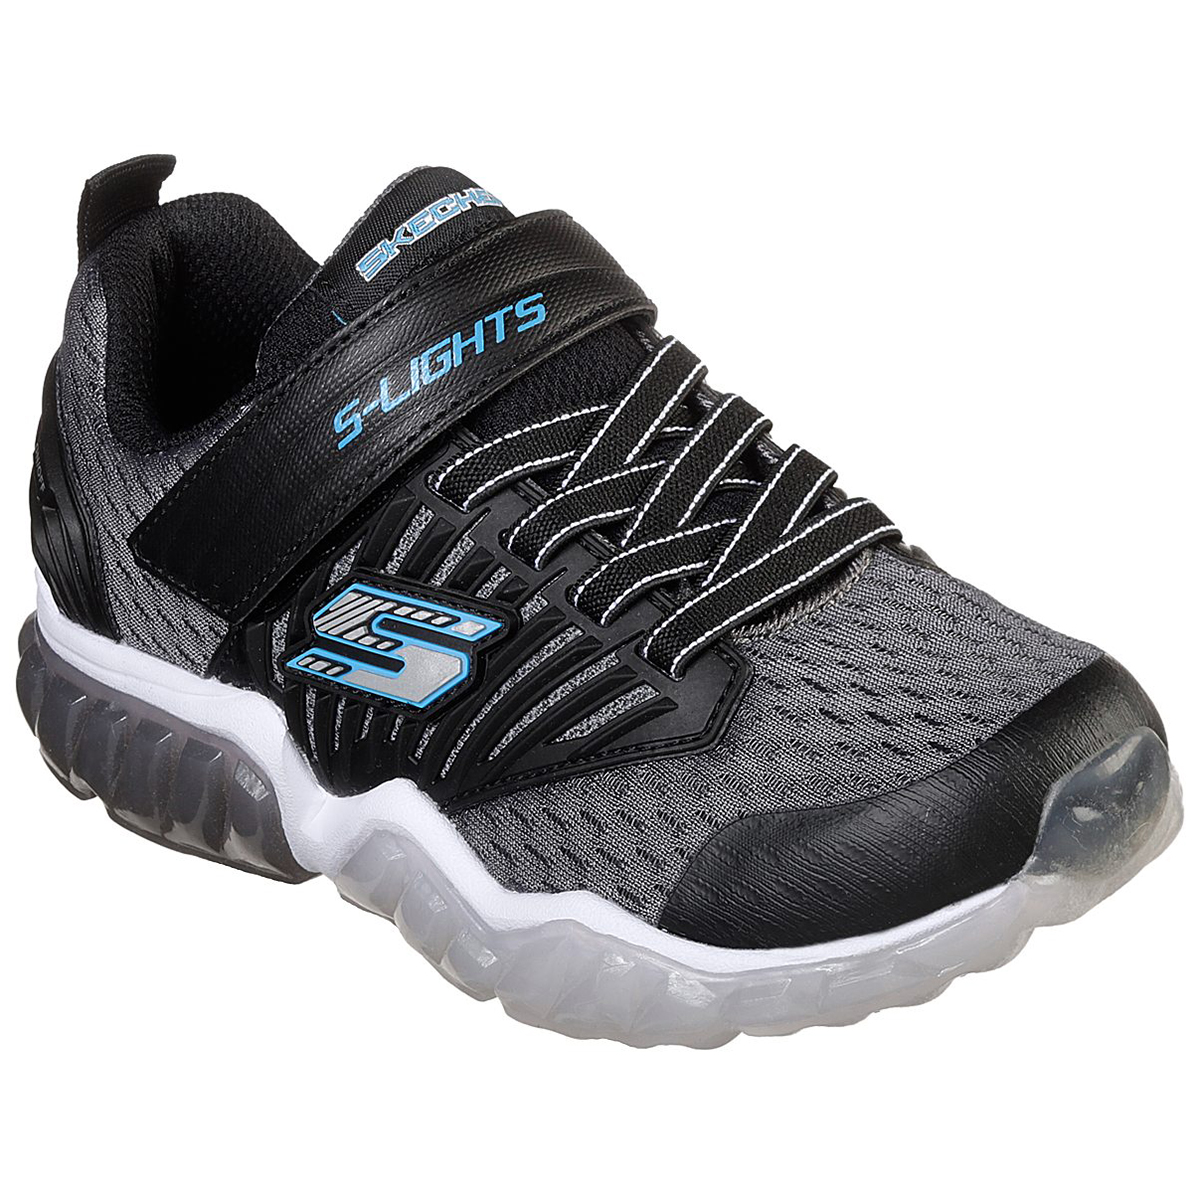 Skechers Boys' S Lights: Rapid Flash Sneakers - Black, 11